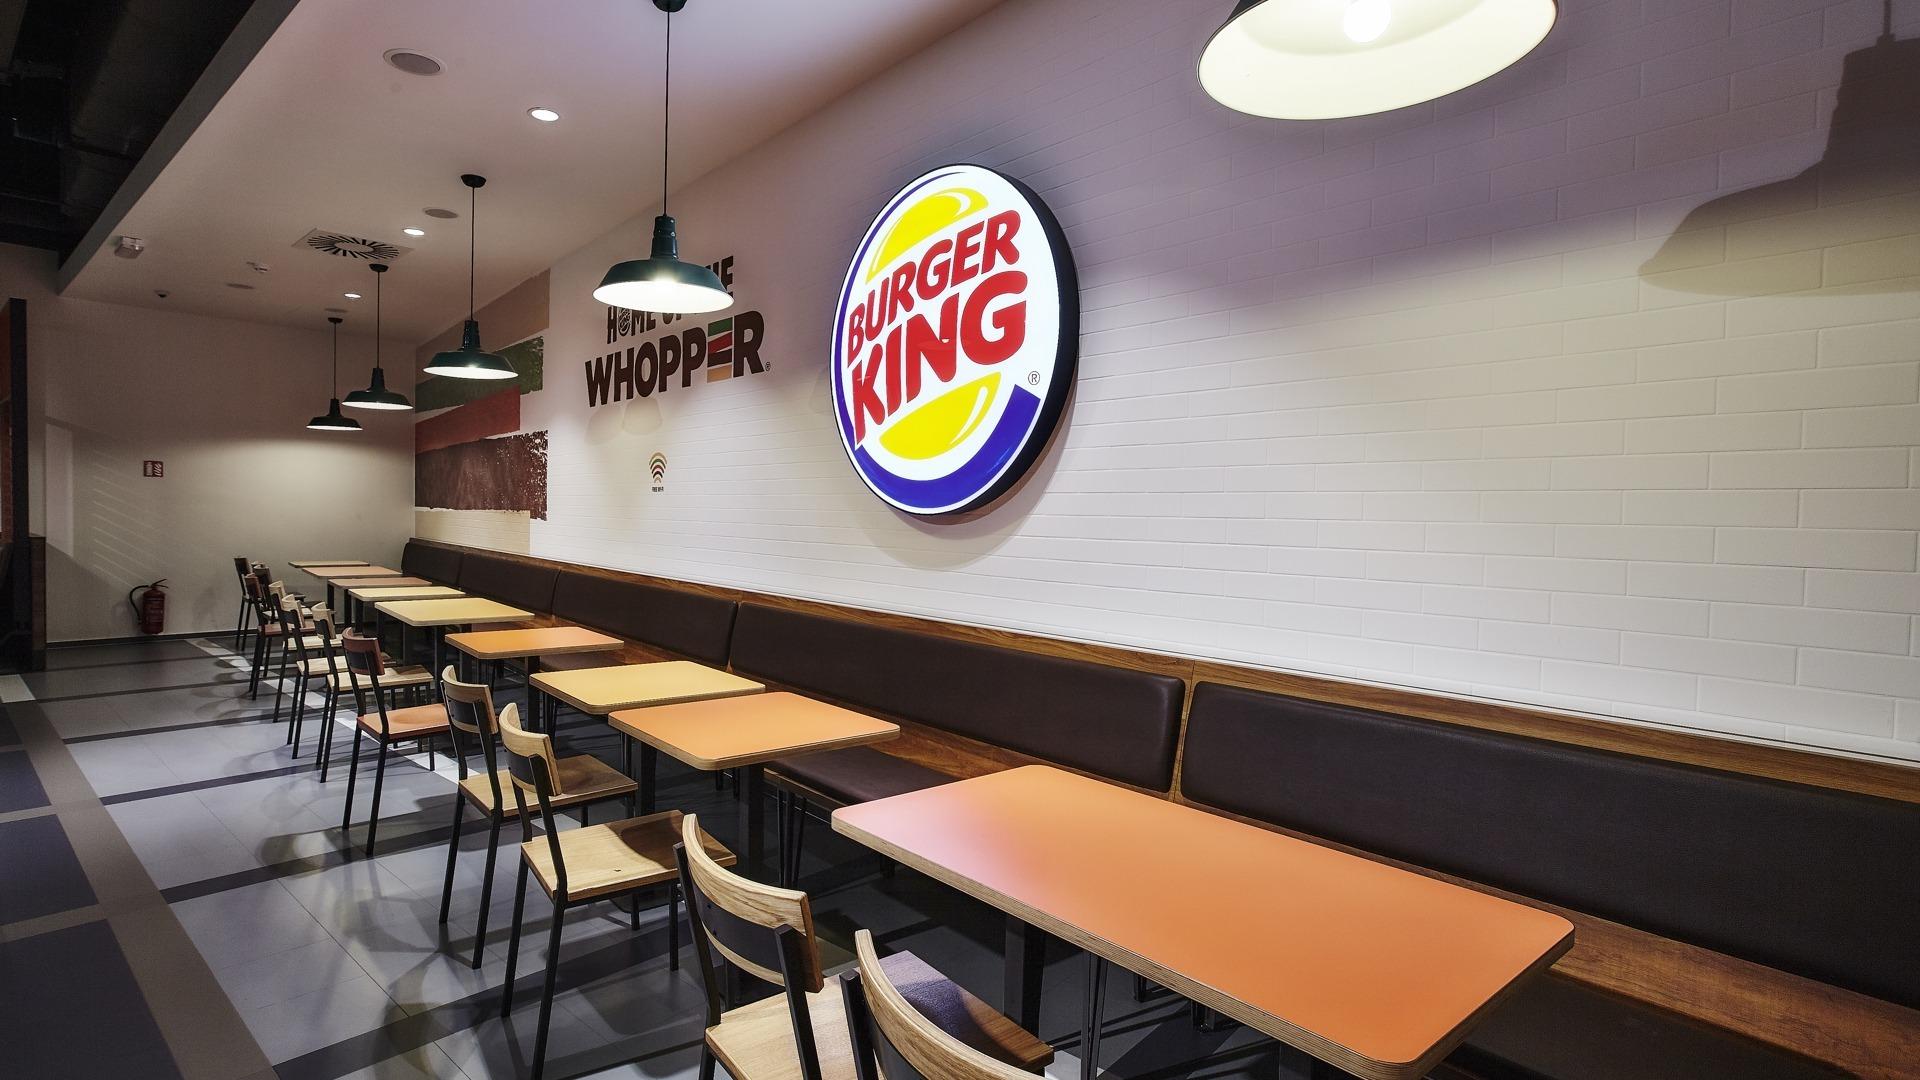 FESCHU Burger King Letiste Praha sezeni osvetleni